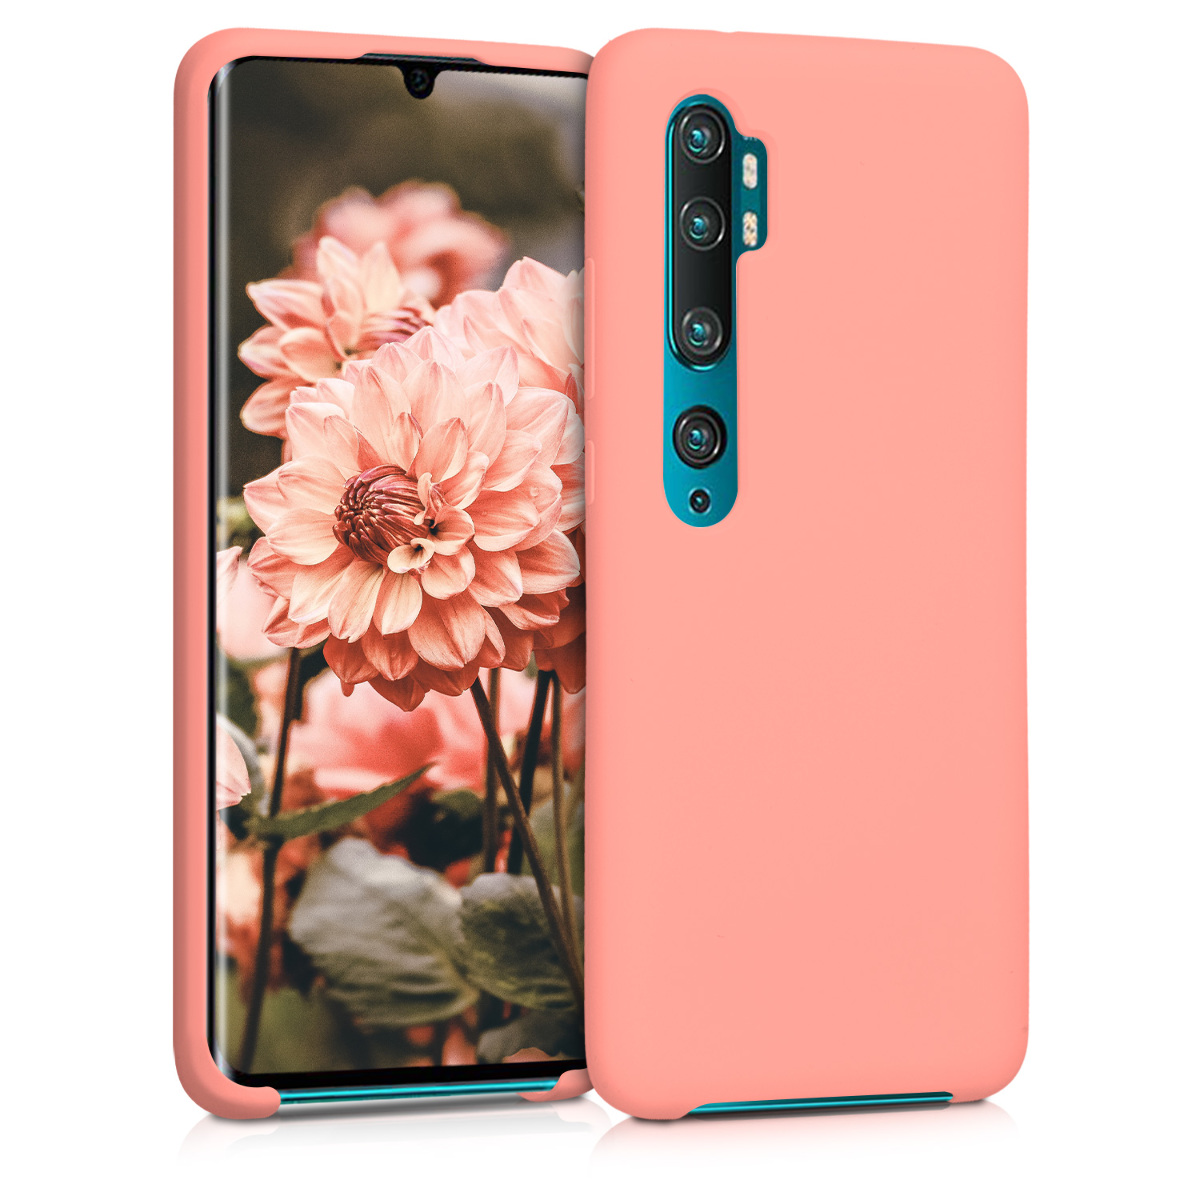 KW Θήκη Σιλικόνης Xiaomi Mi Note 10 / Note 10 Pro - Soft Flexible Rubber - Coral Matte (50949.56)